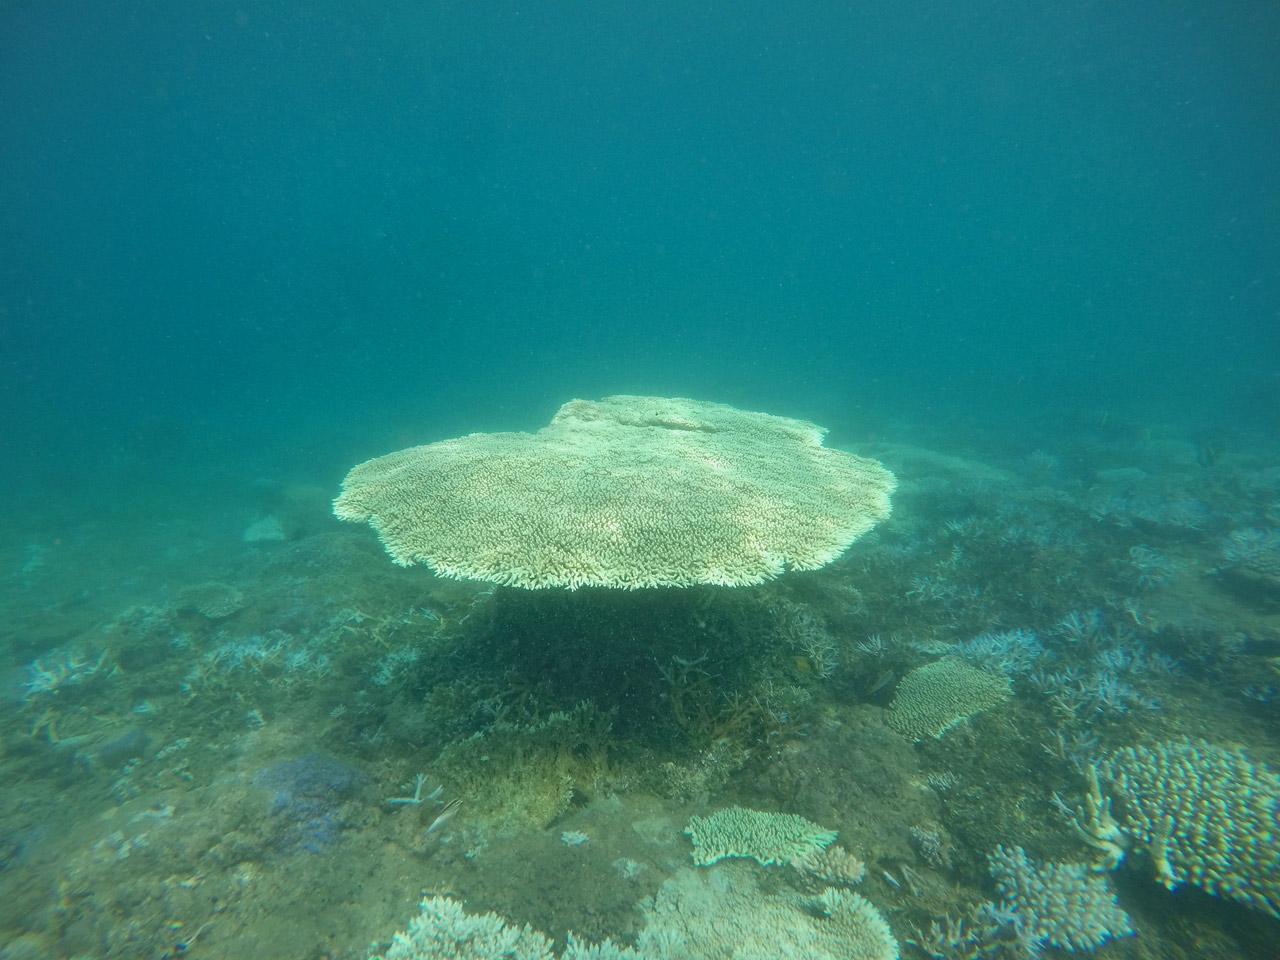 Teluk Kiluan - Tempat Wisata di Lampung - Yopie Pangkey - 9